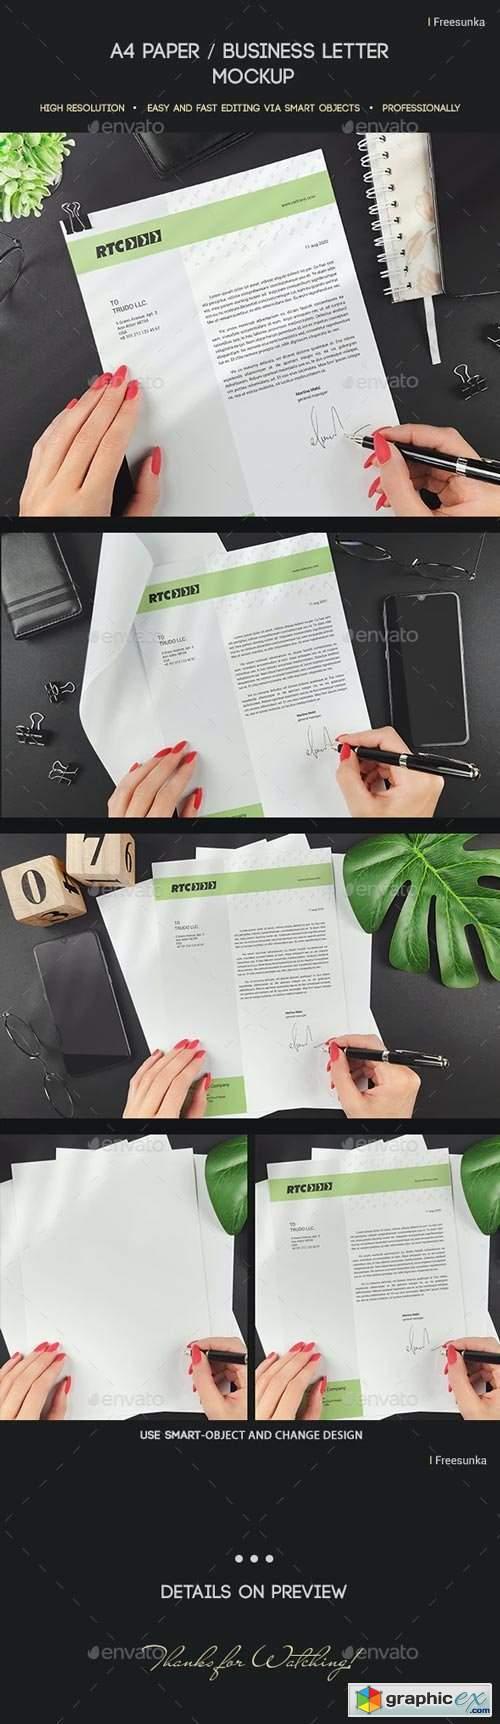 A4 Paper / Business Letter Mockup